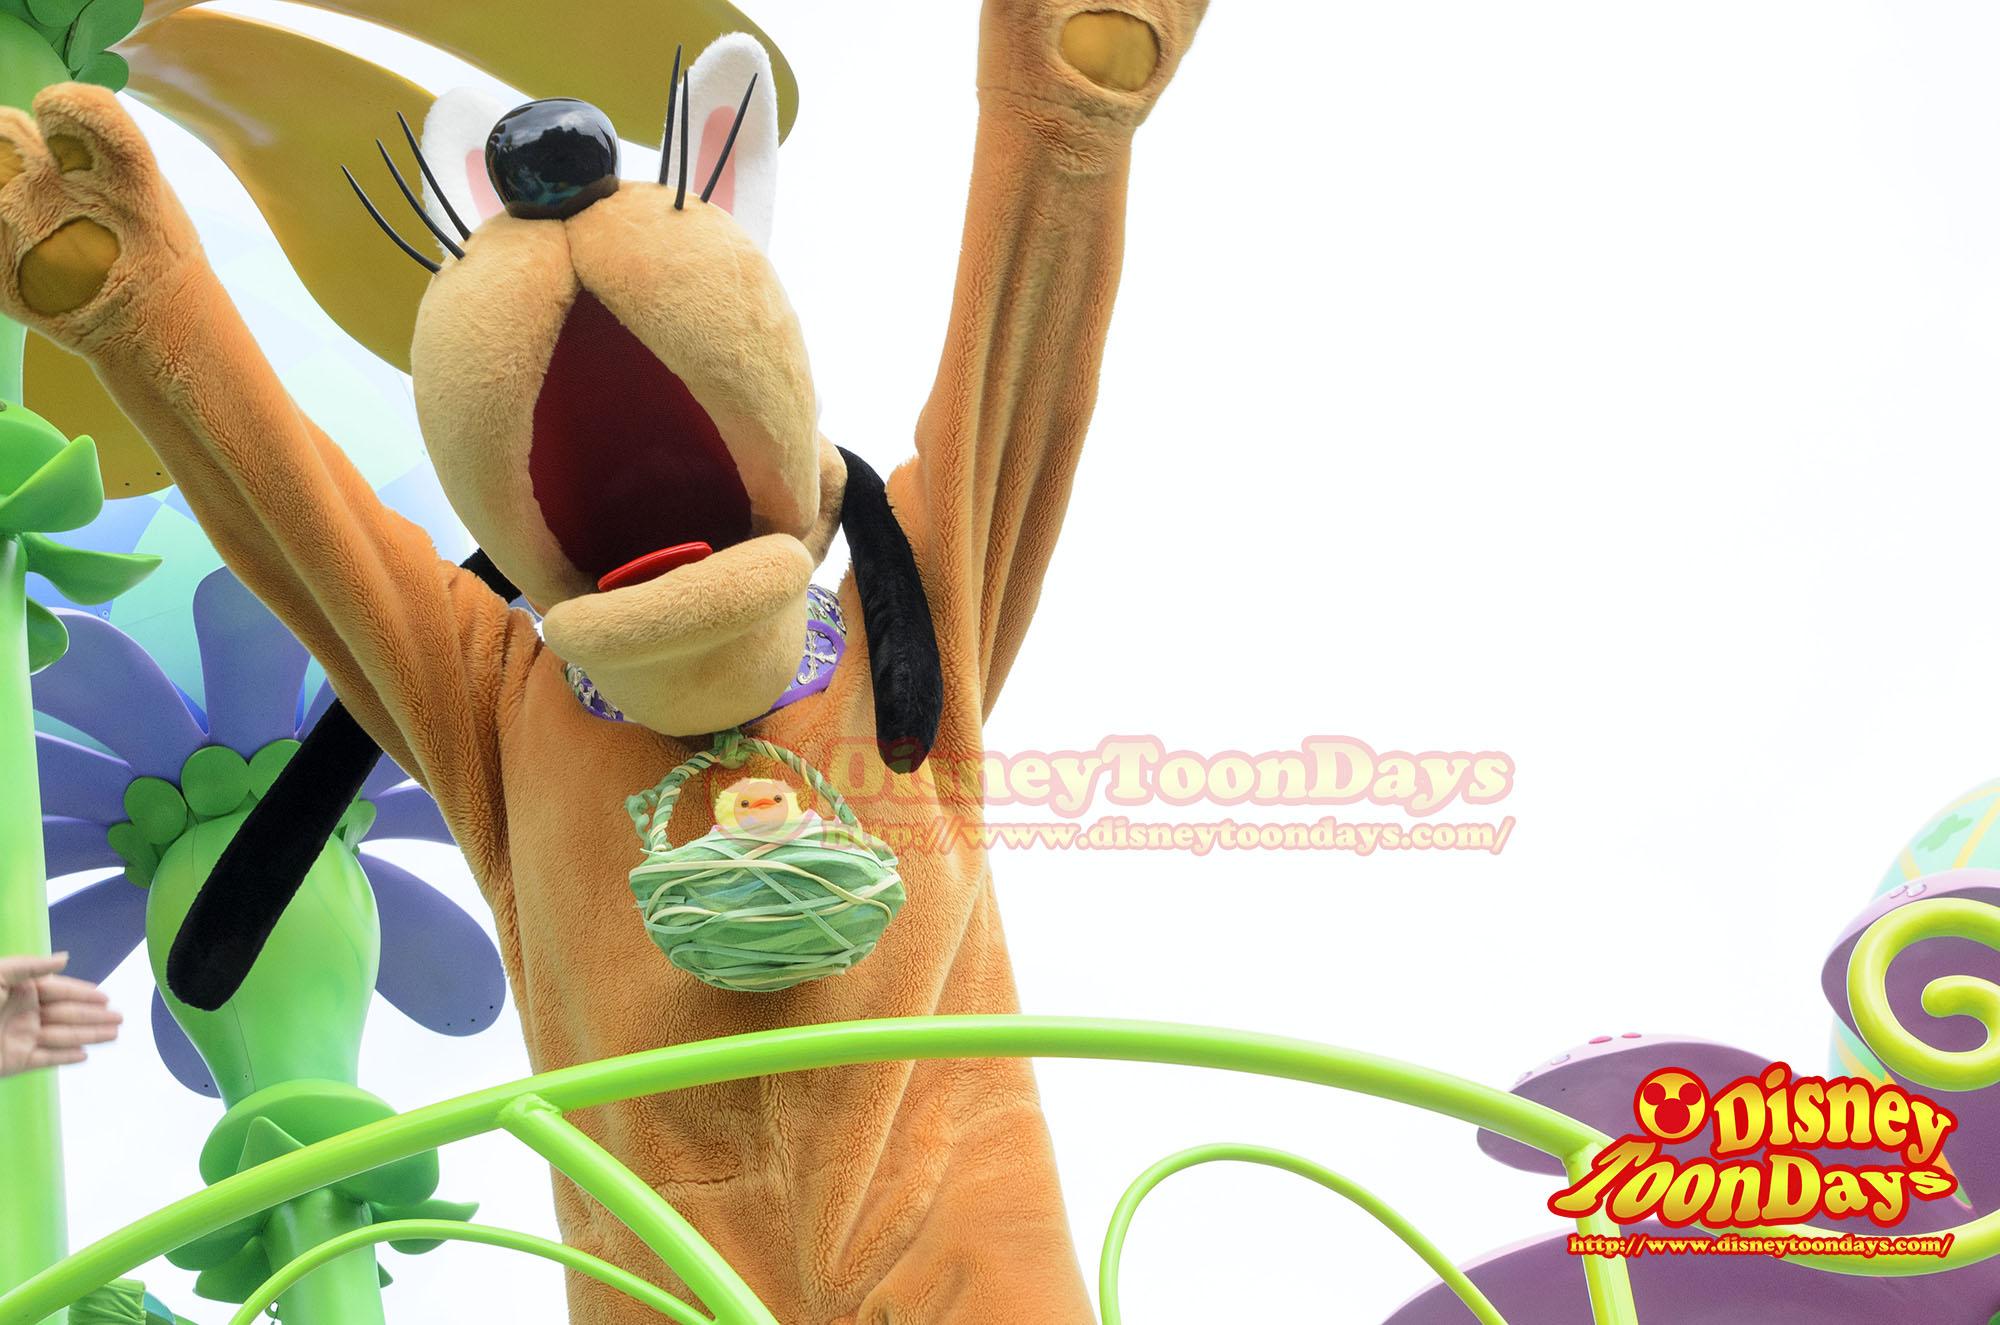 TDL ディズニー・イースター 2014 ヒッピティ・ホッピティ・スプリングタイム プルート